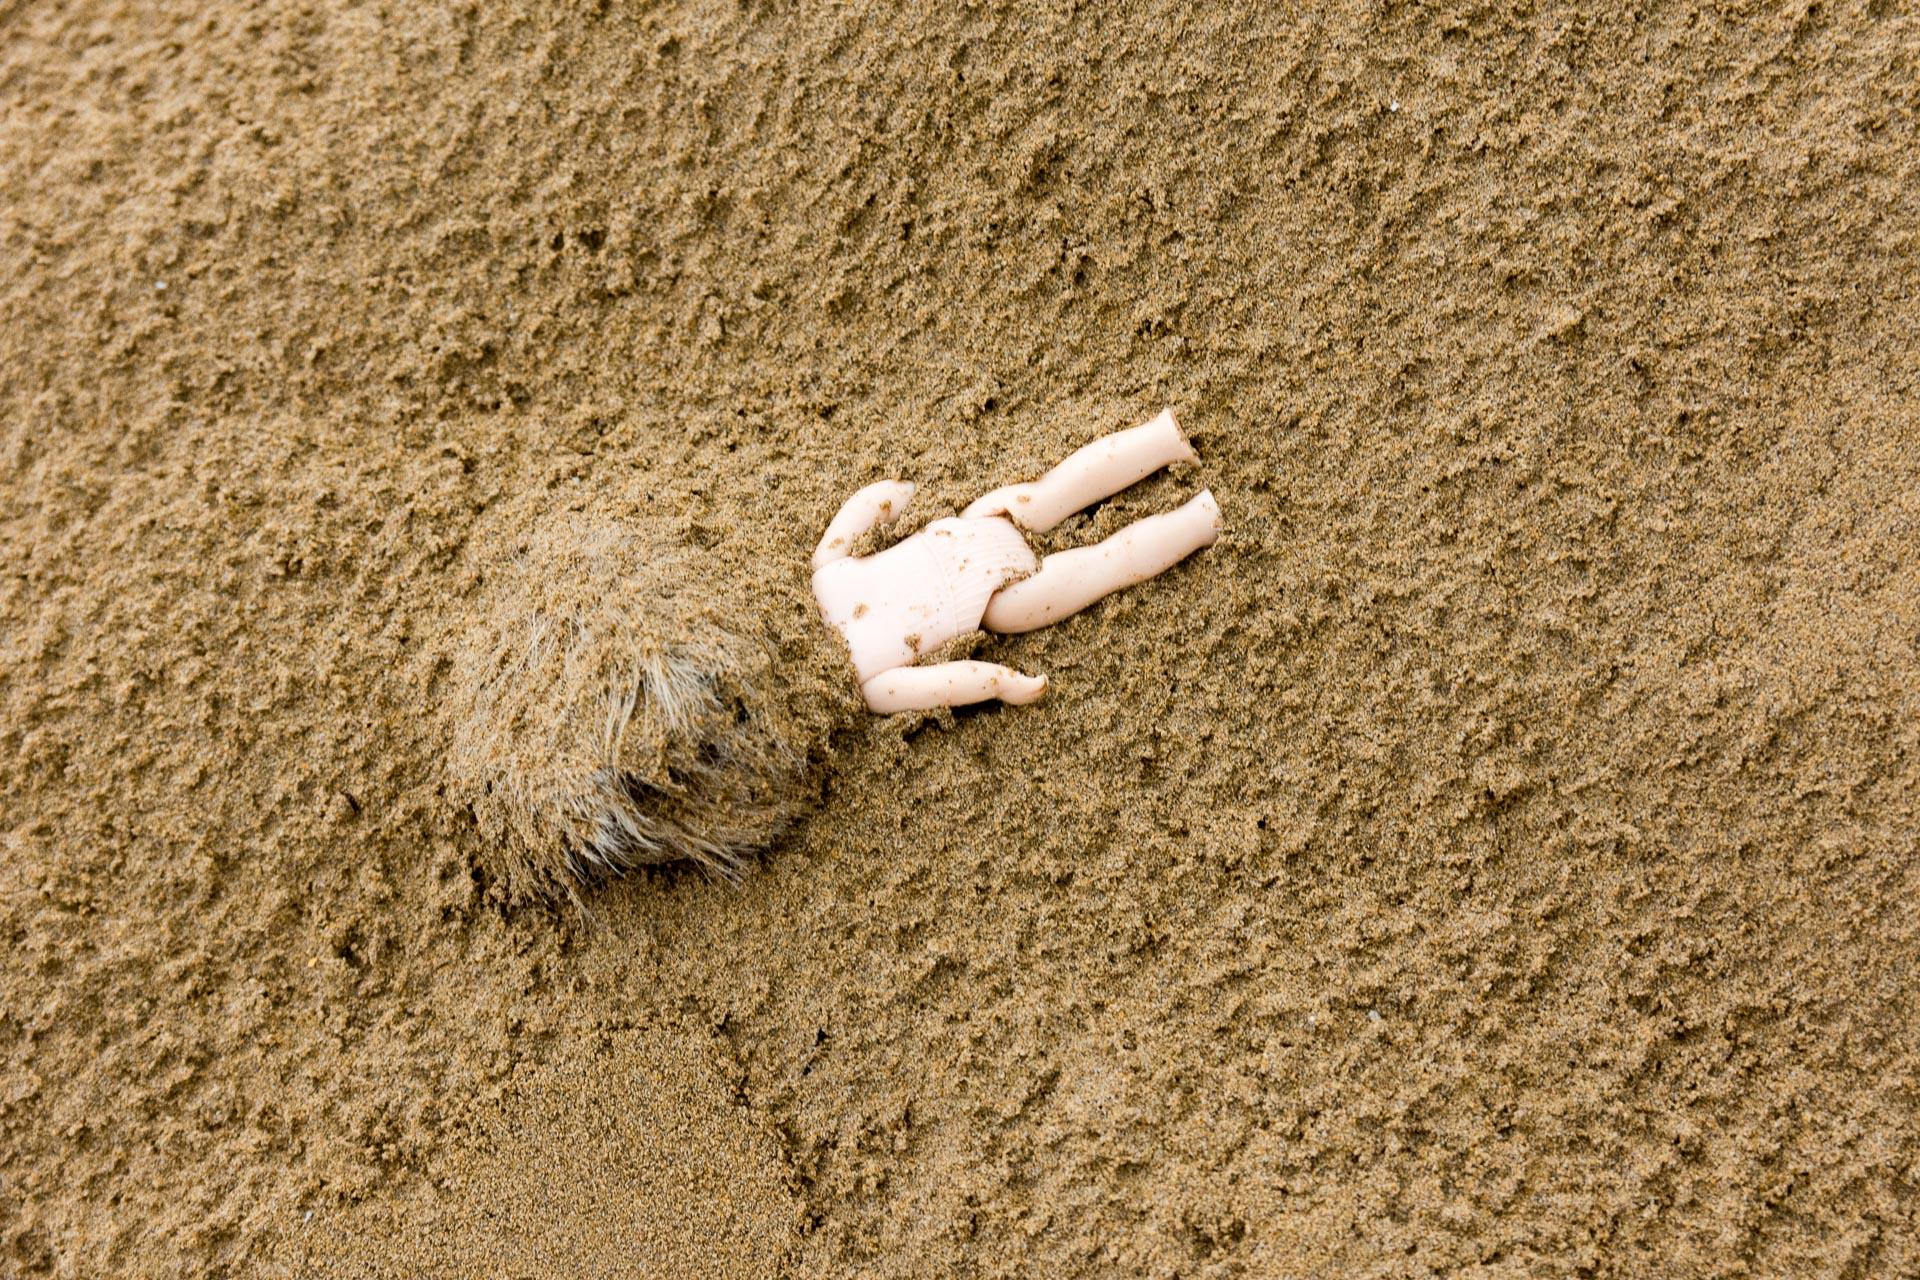 Zabawka na piasku